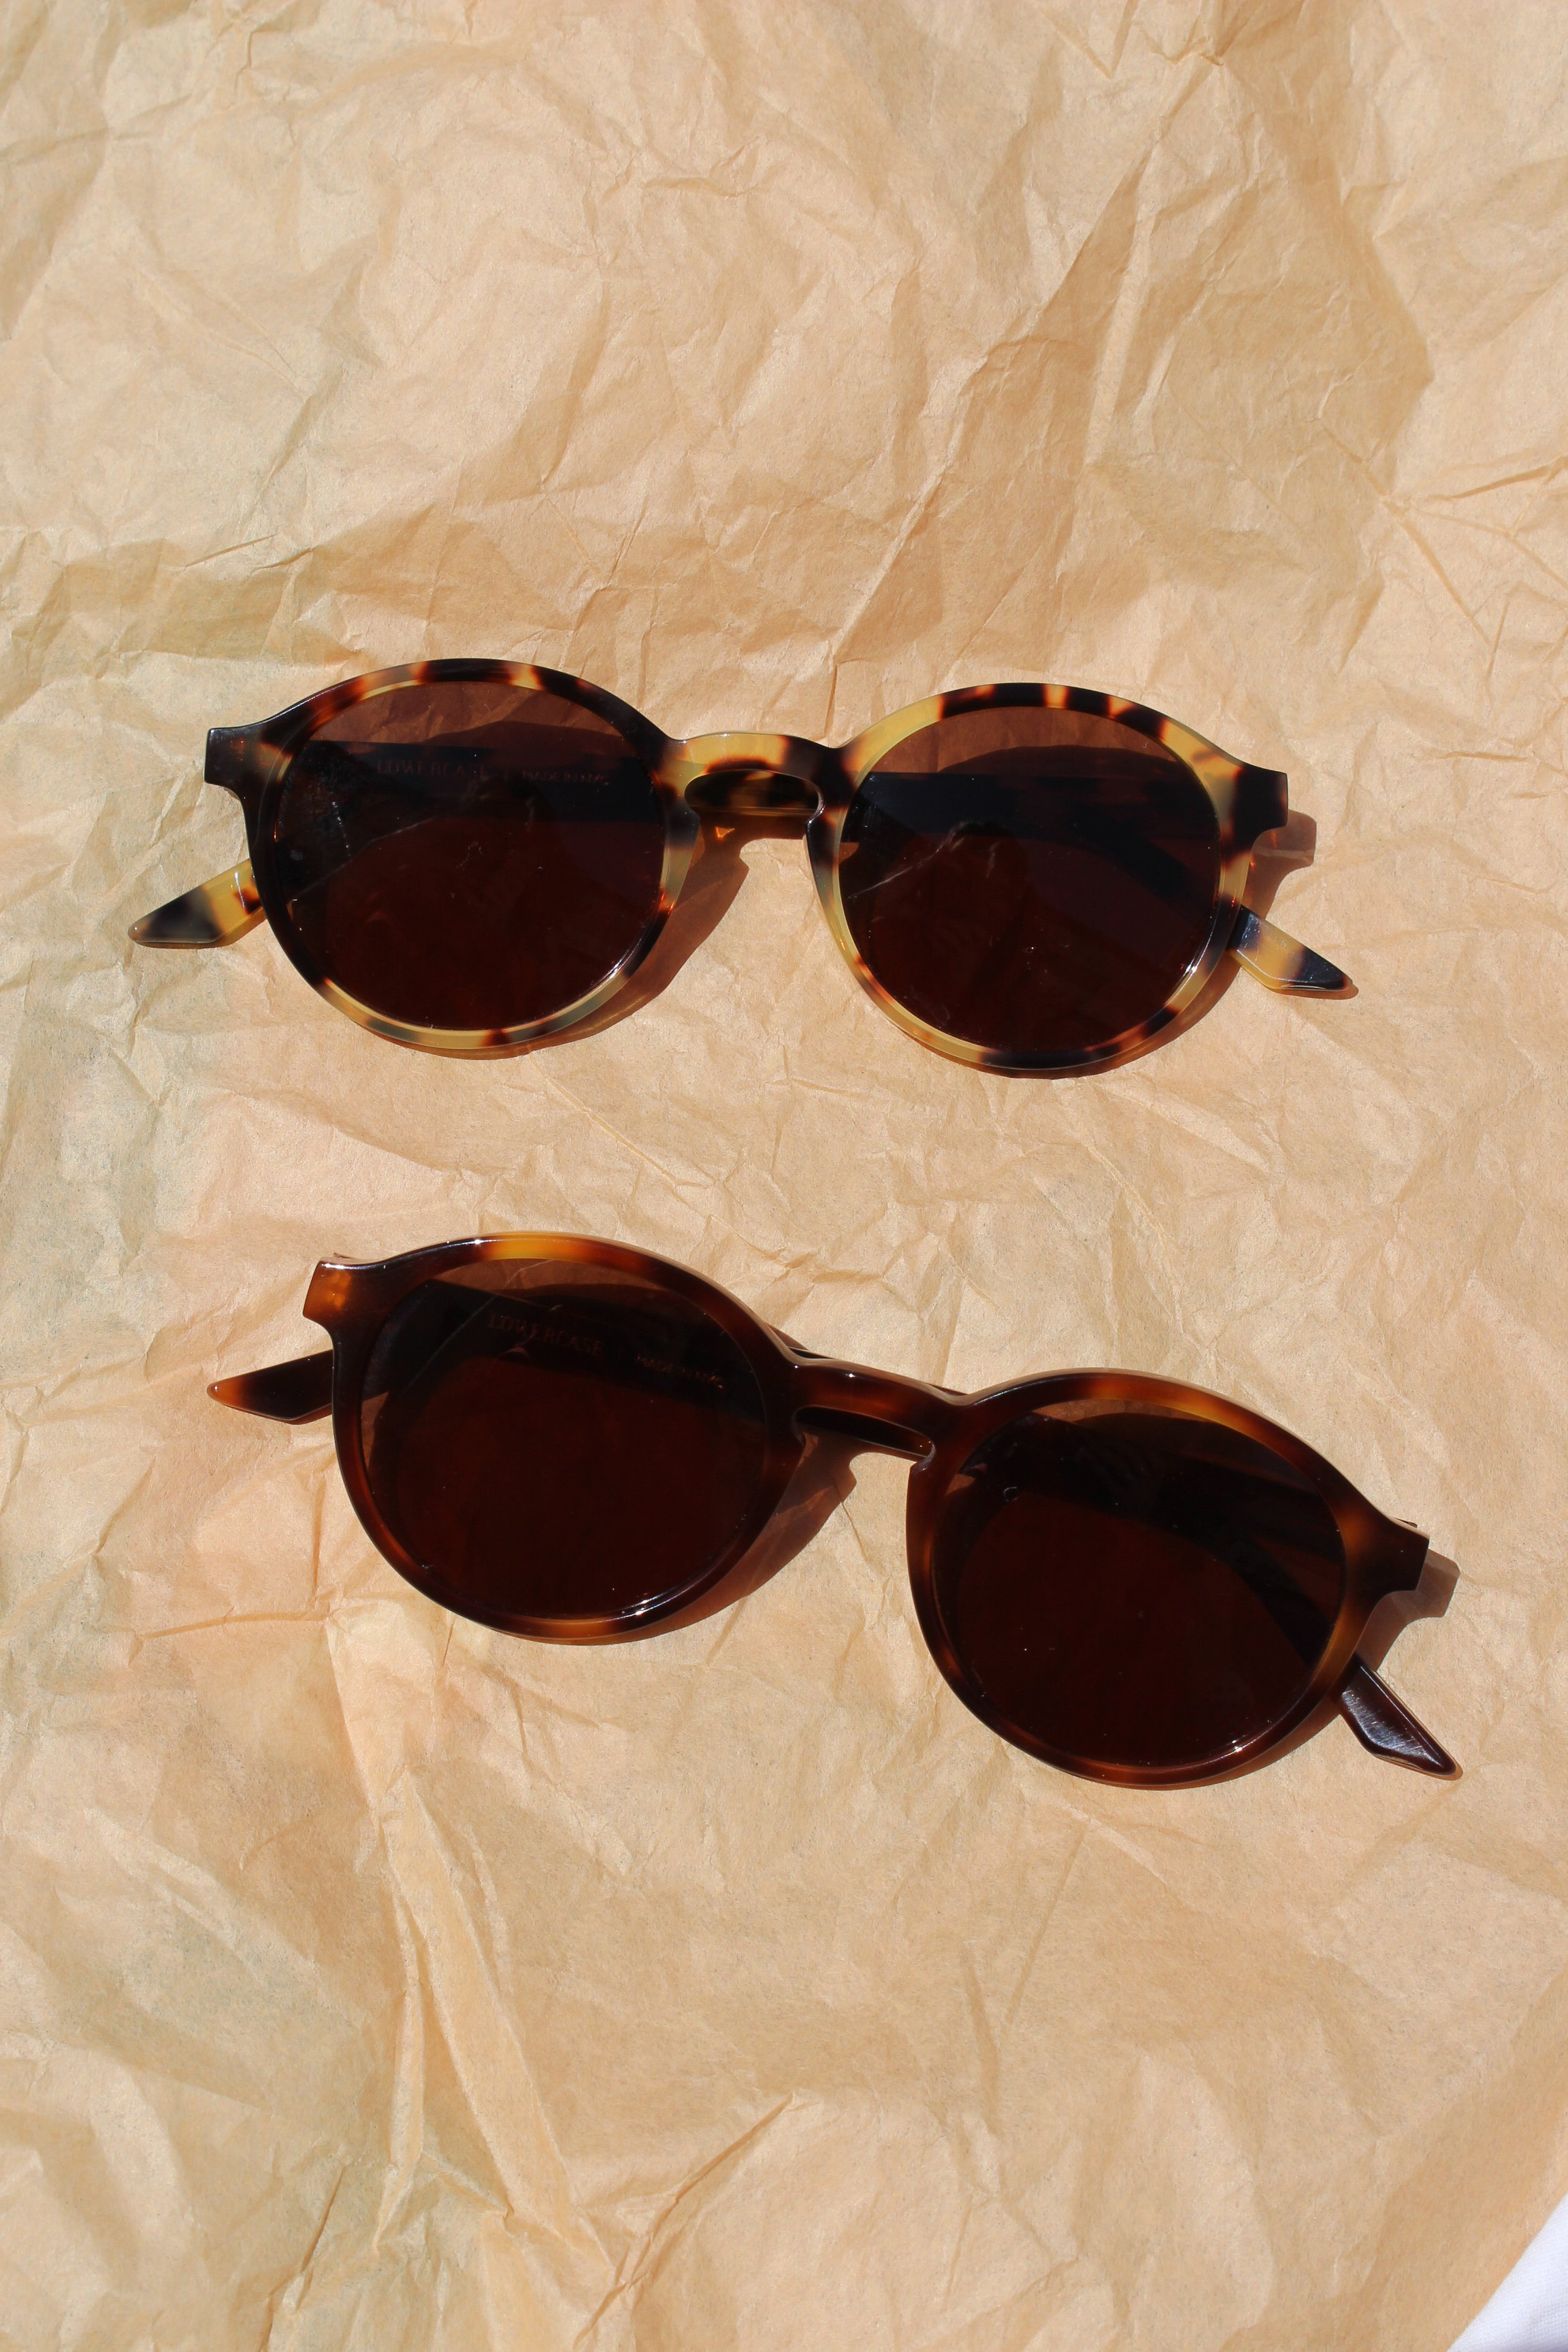 lowercase nyc Carr sunglasses | Garmentory